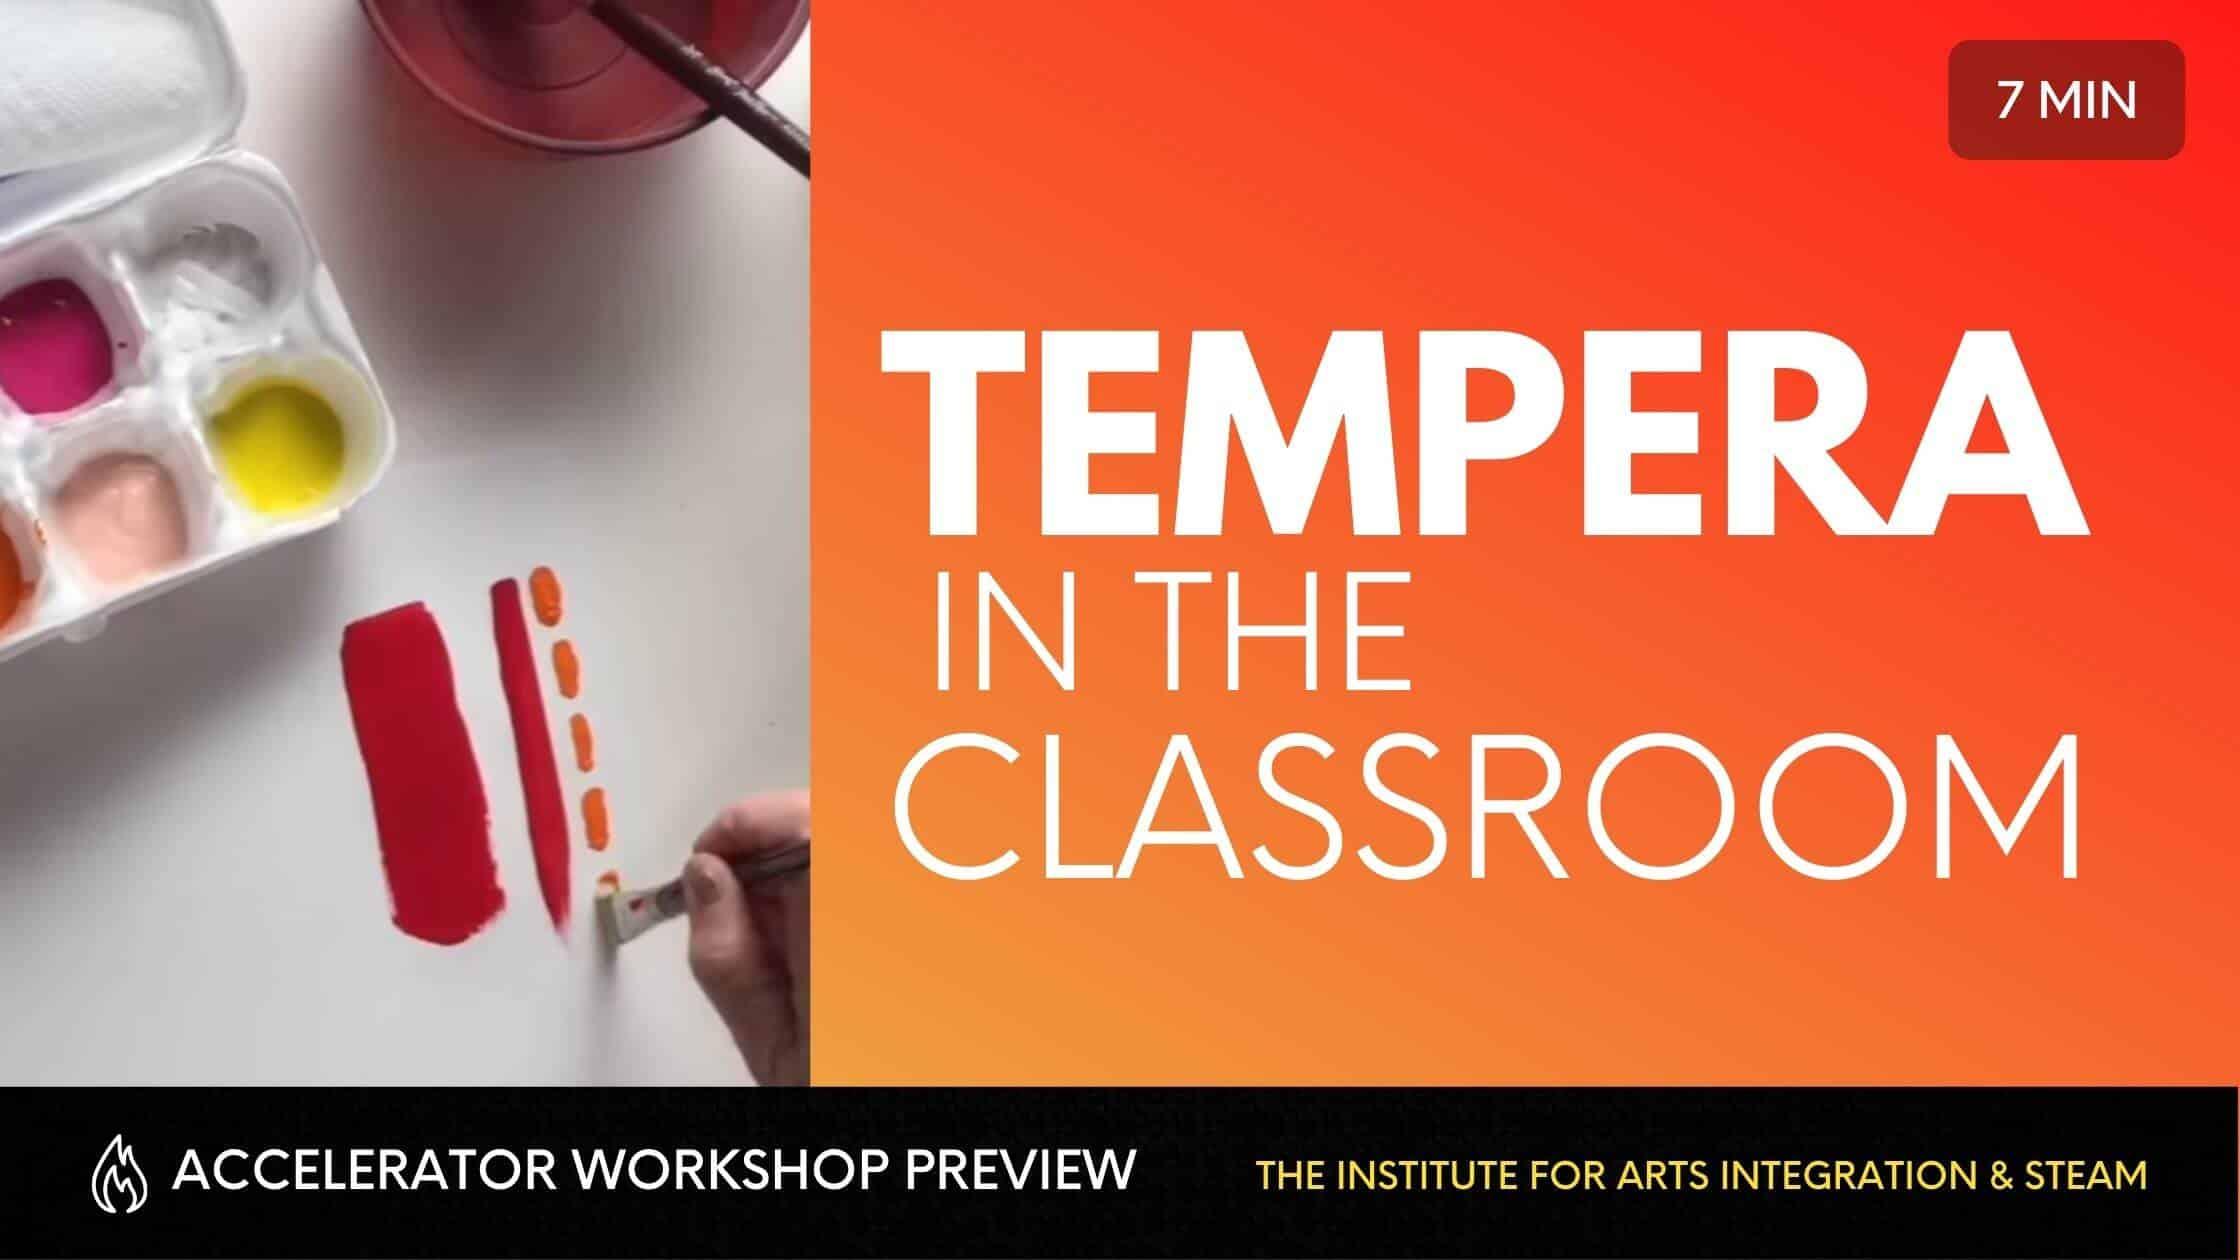 tempera in the classroom